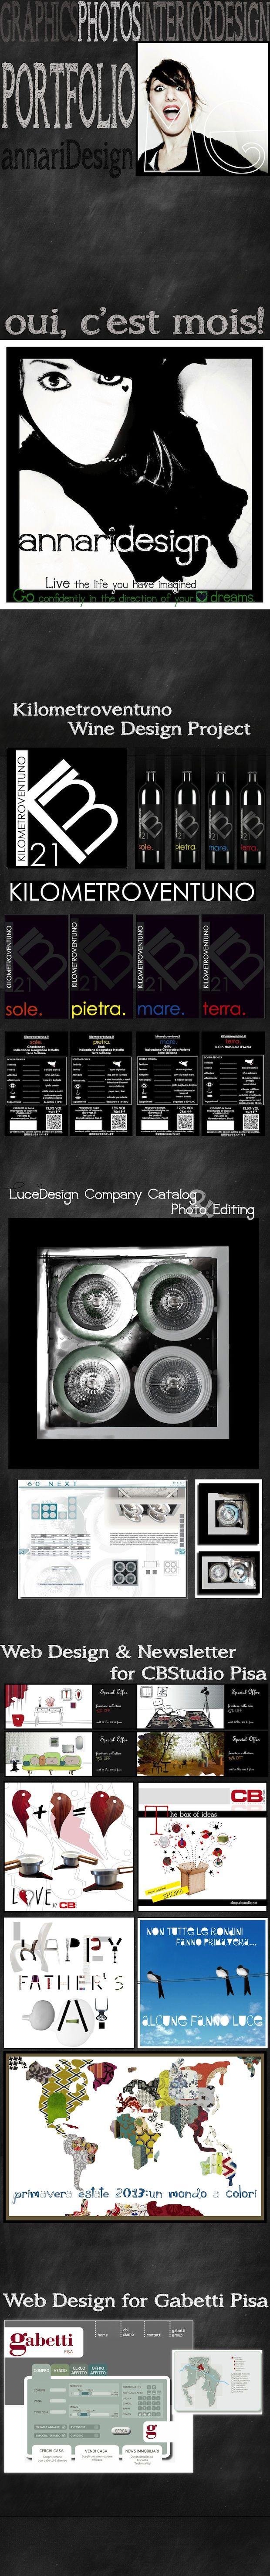 three Graphic design Web design Sketch Photo editing